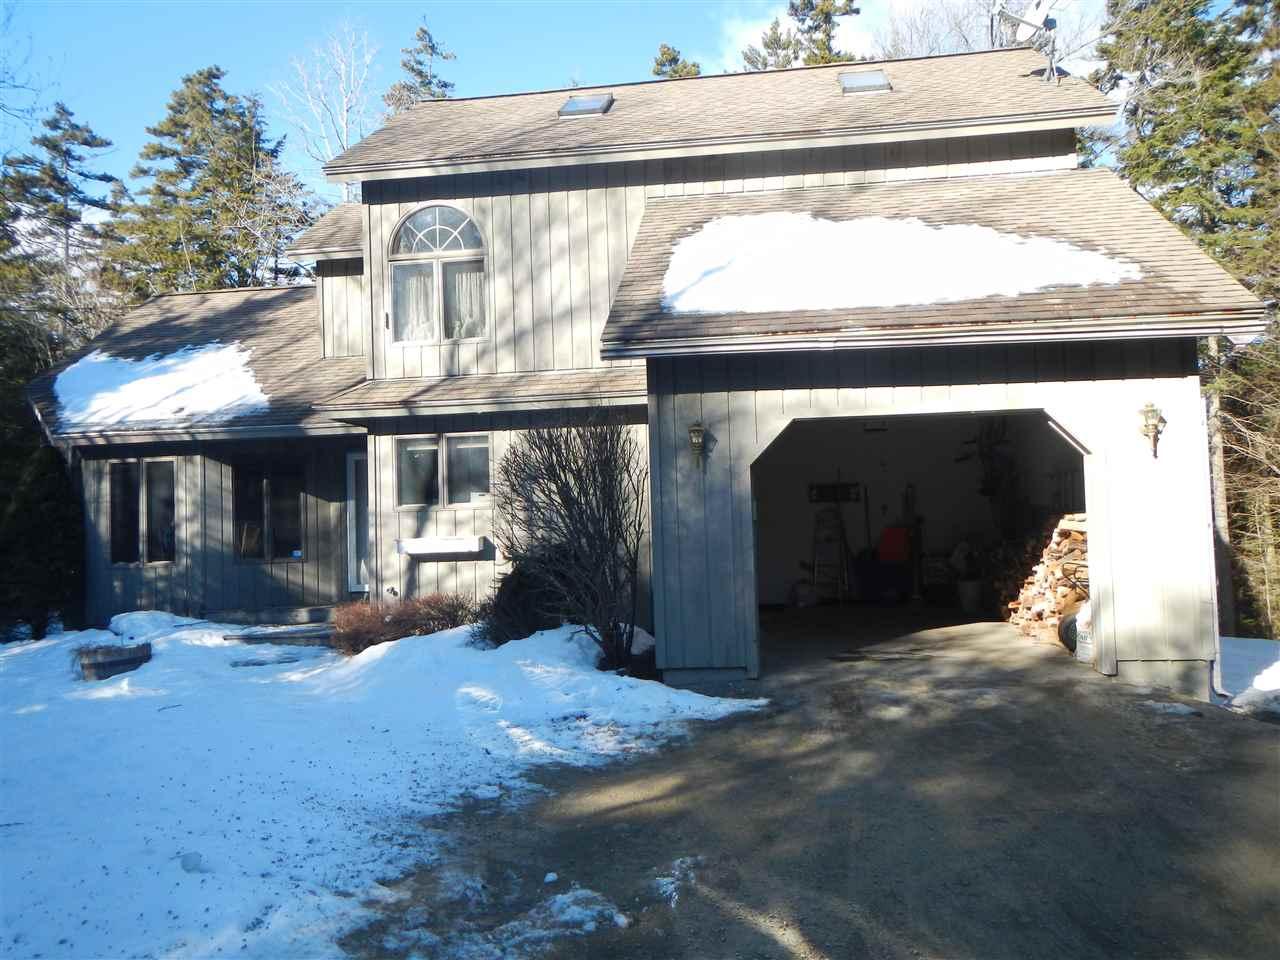 Mount-Snow-Real-Estate-4614310-20